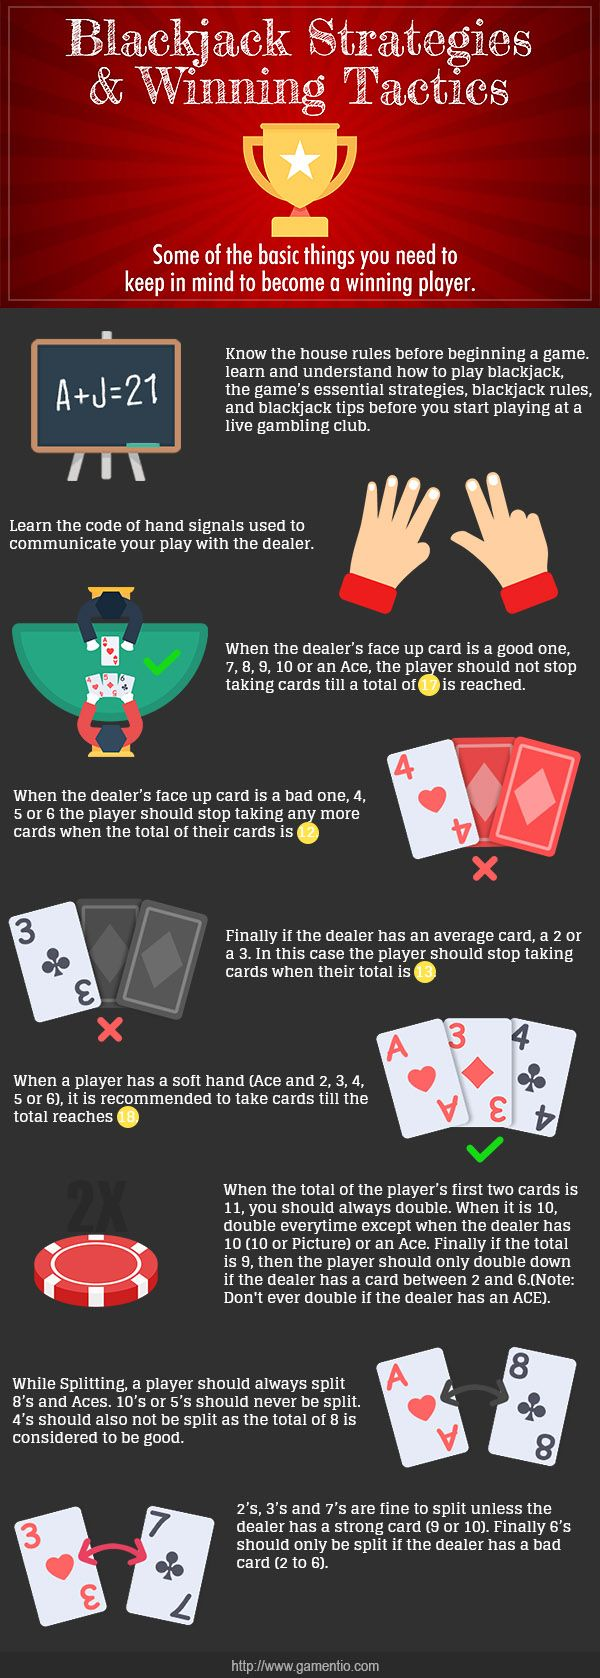 Gambling anonymous dallas